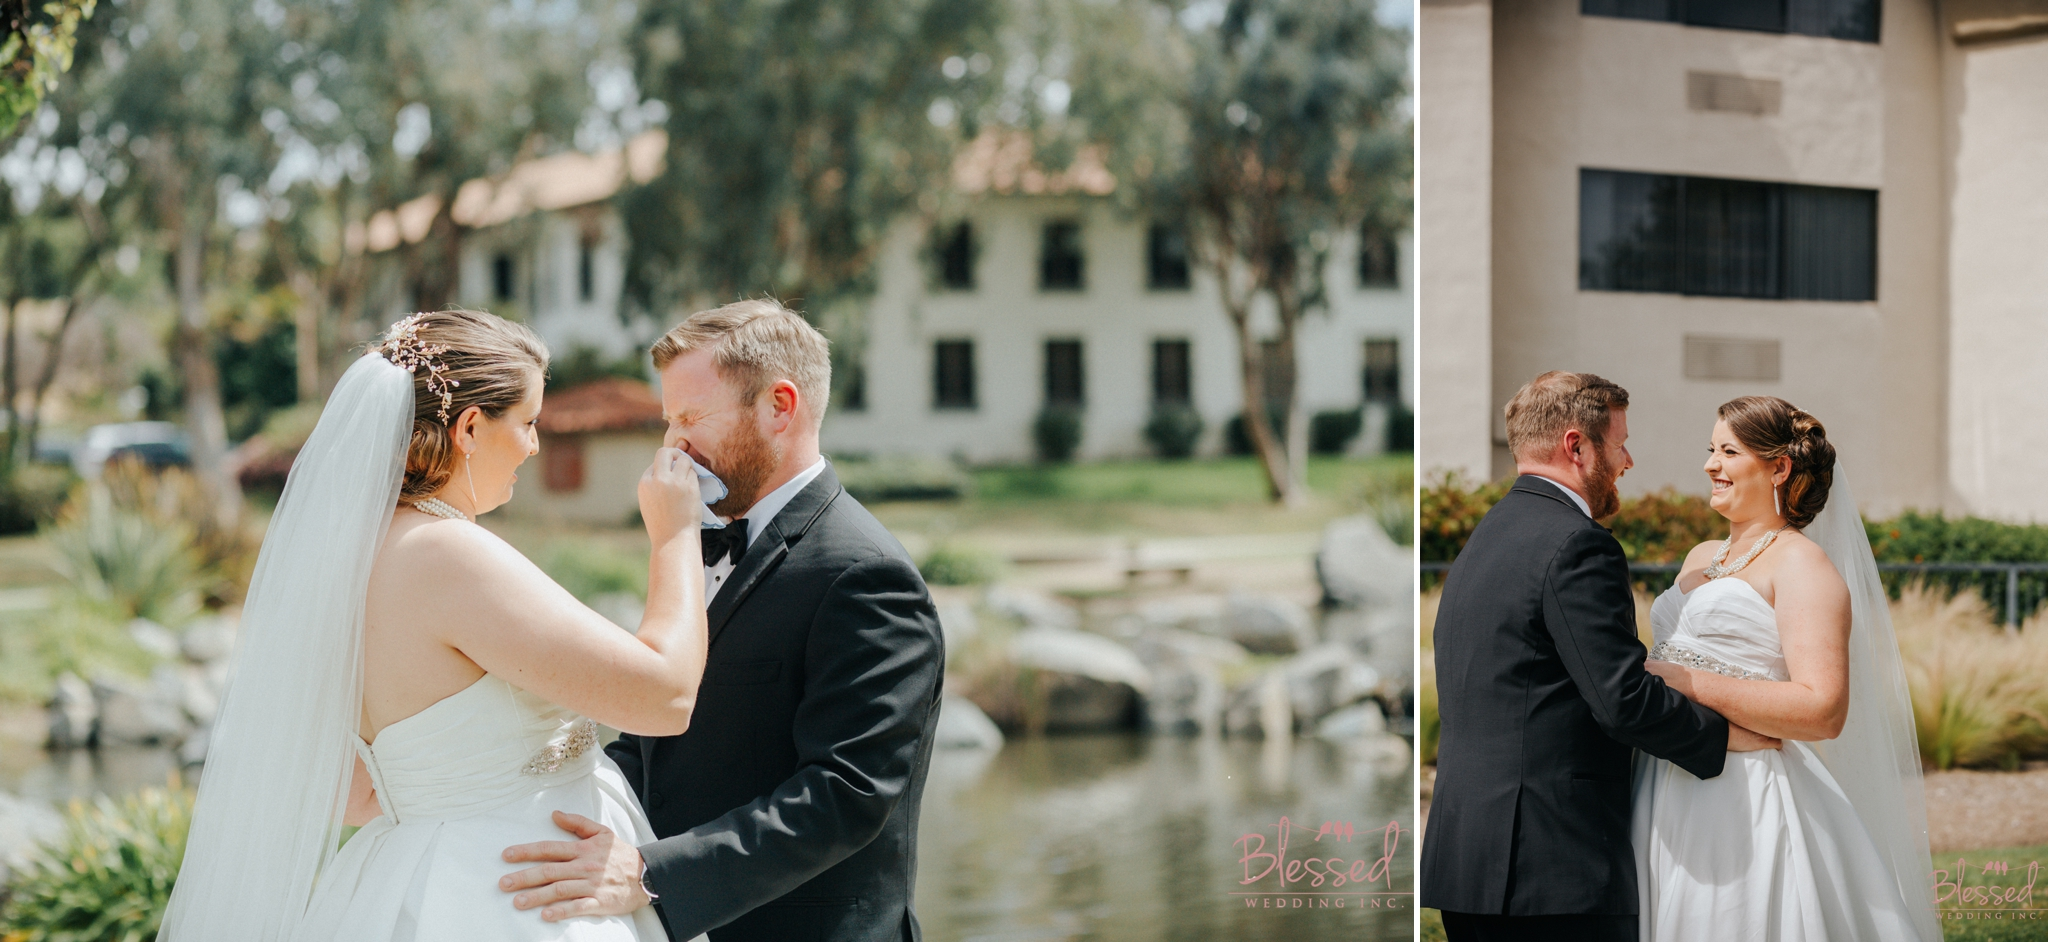 Orfila Vinery Wedding by Blessed Wedding Photography 22.jpg